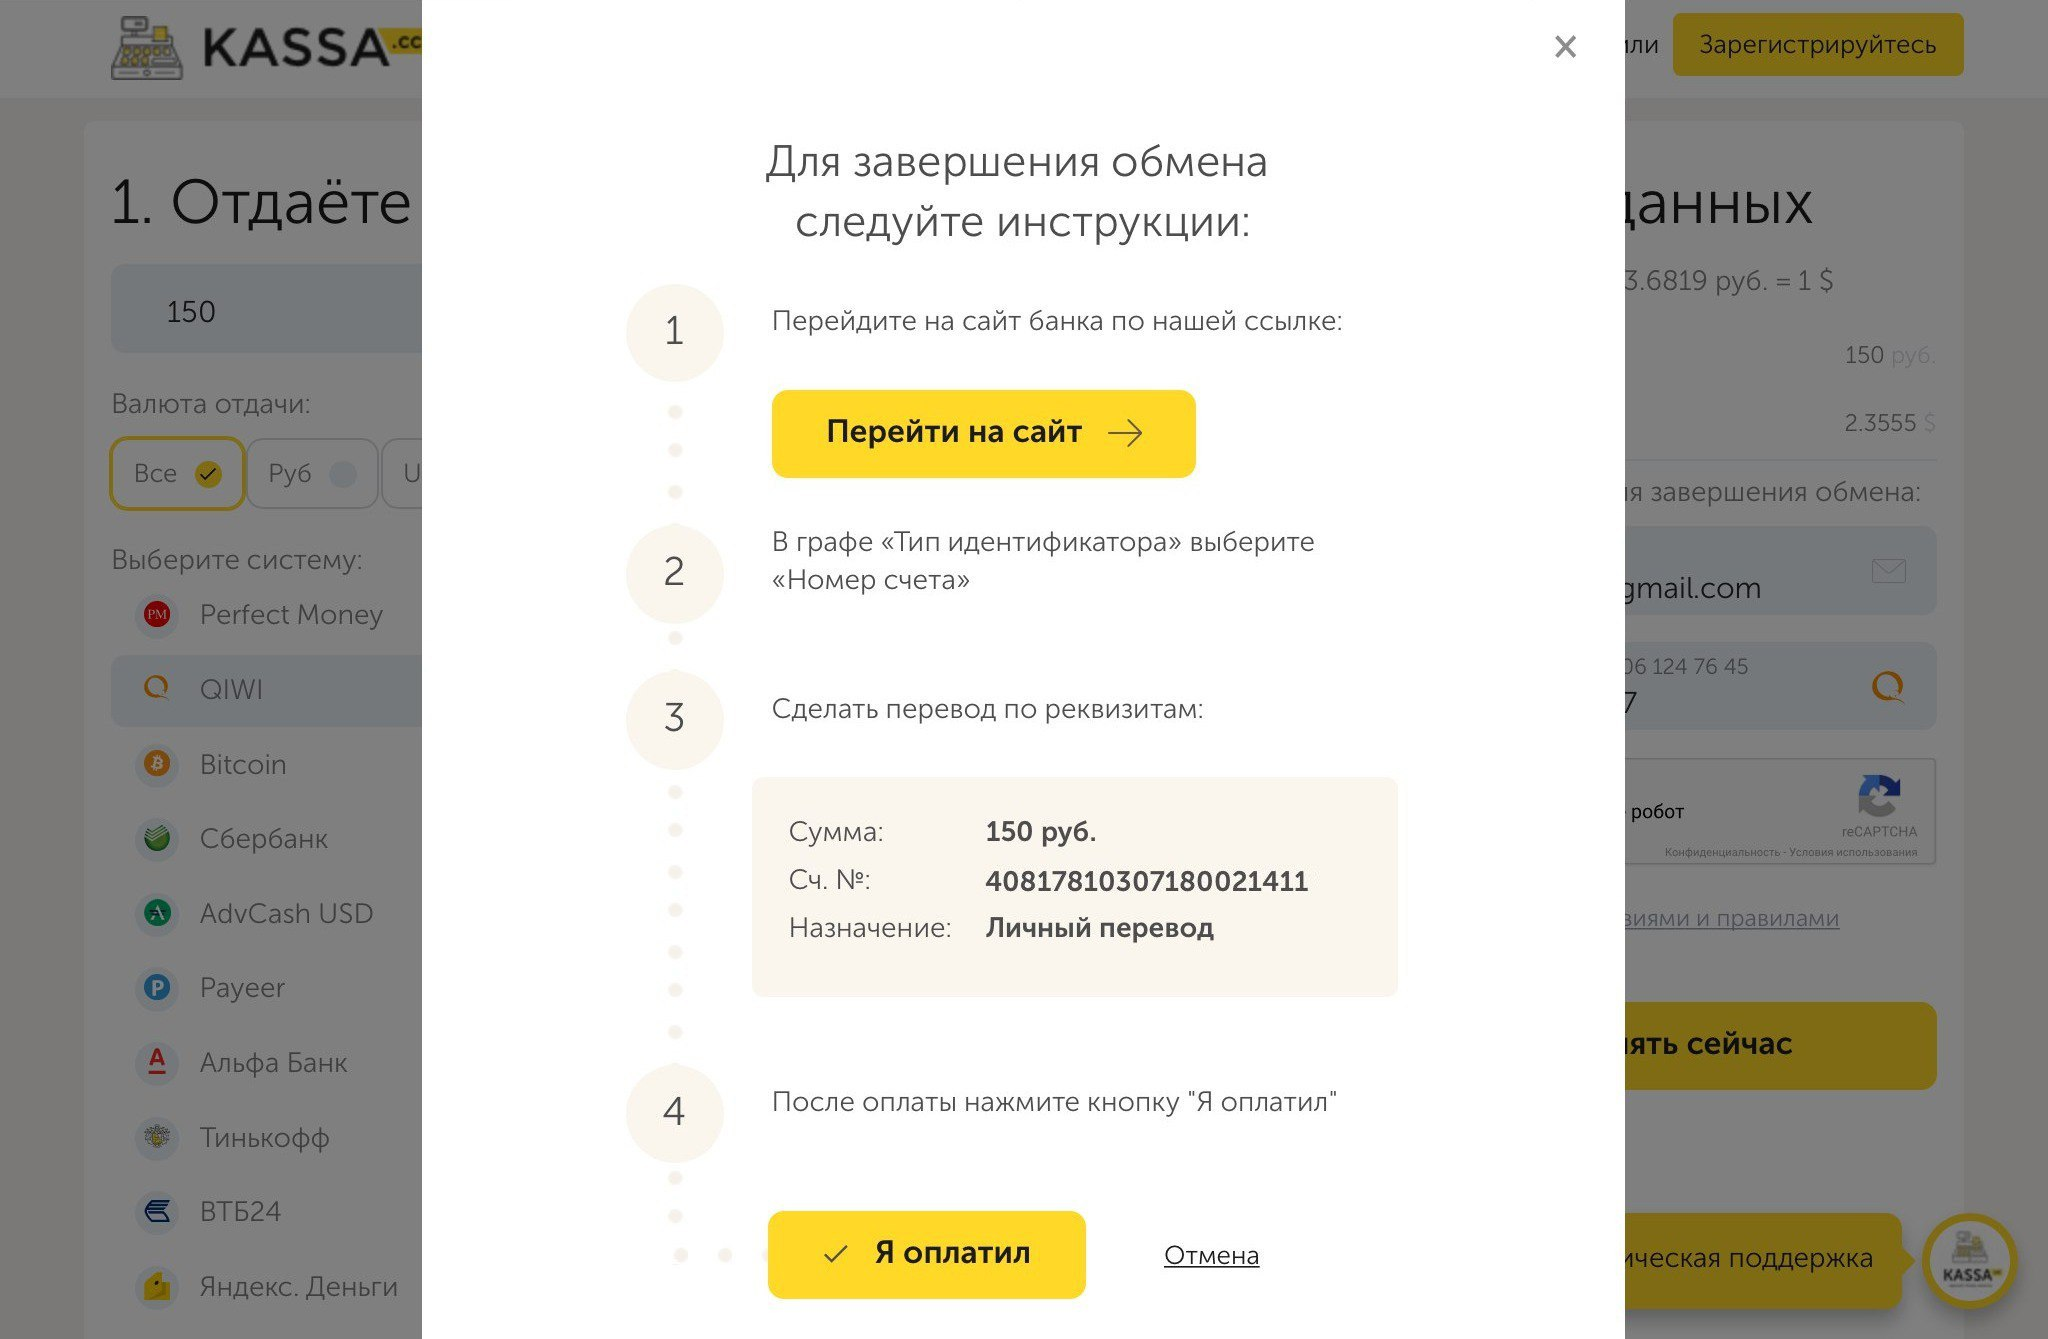 Kassa.cc - единый обмен валюты. Обмен QIWI RUB на PM e-Voucher USD